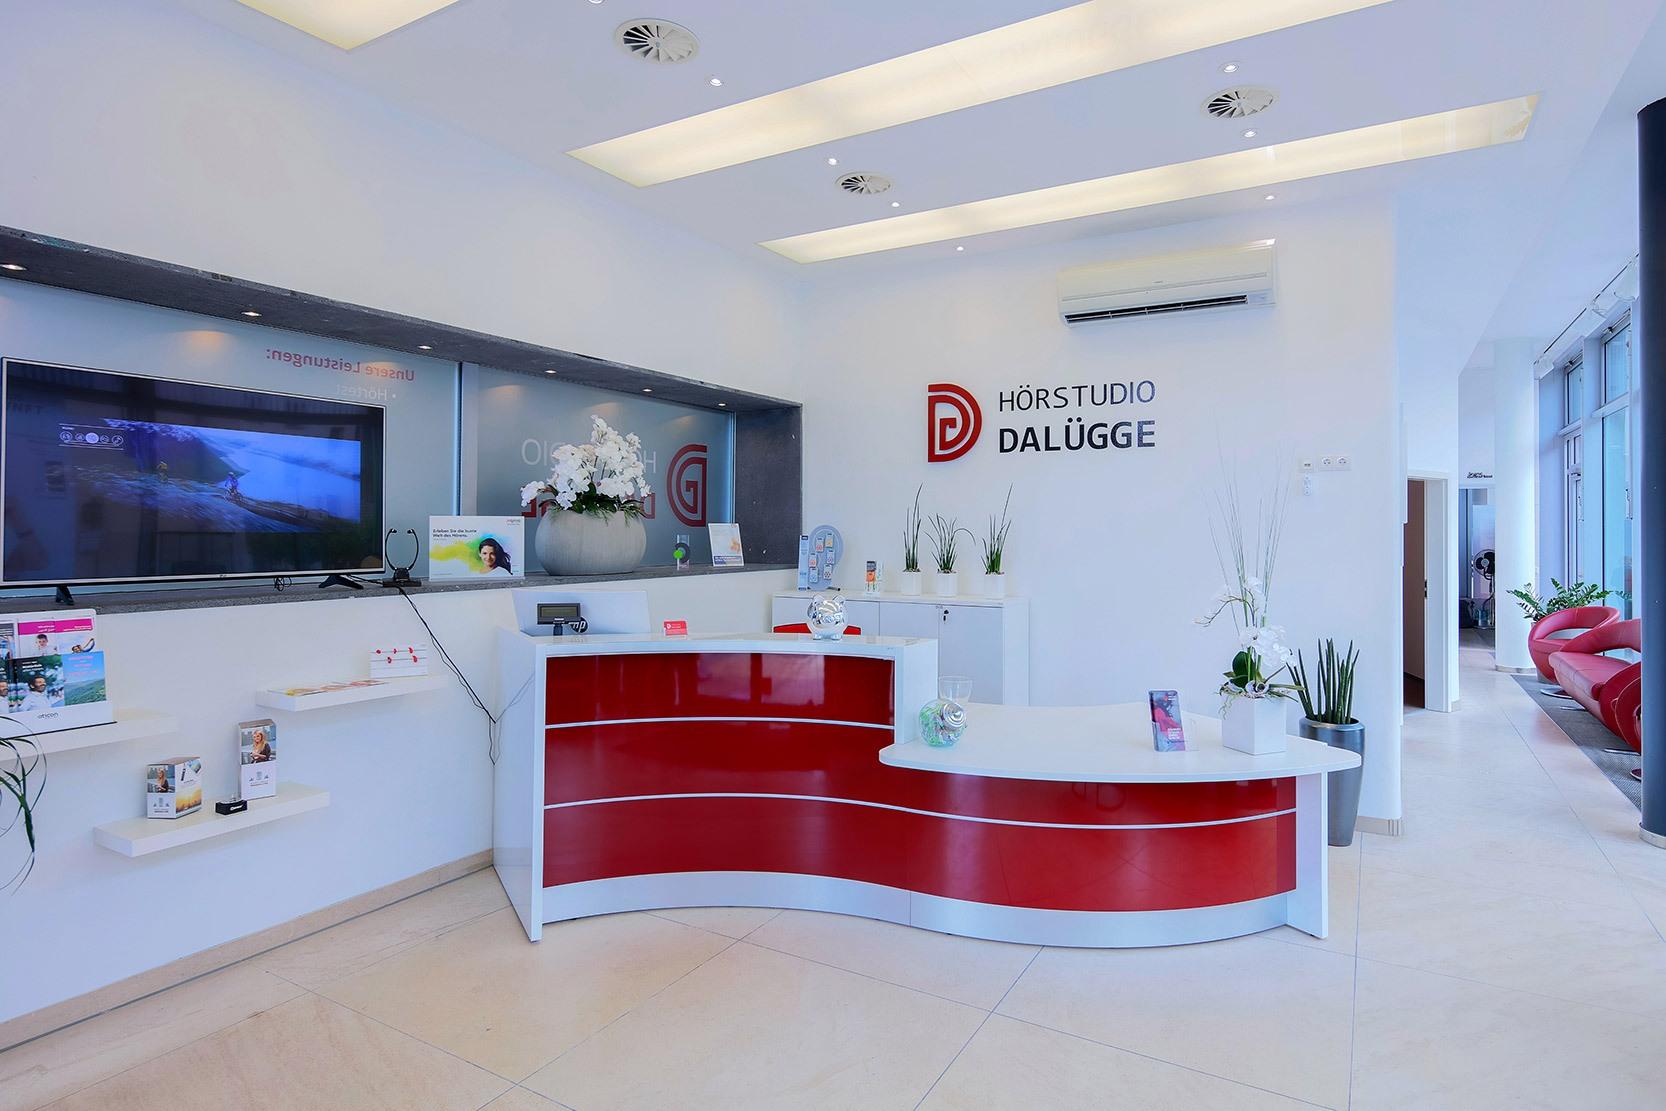 Hörstudio Dalügge GmbH